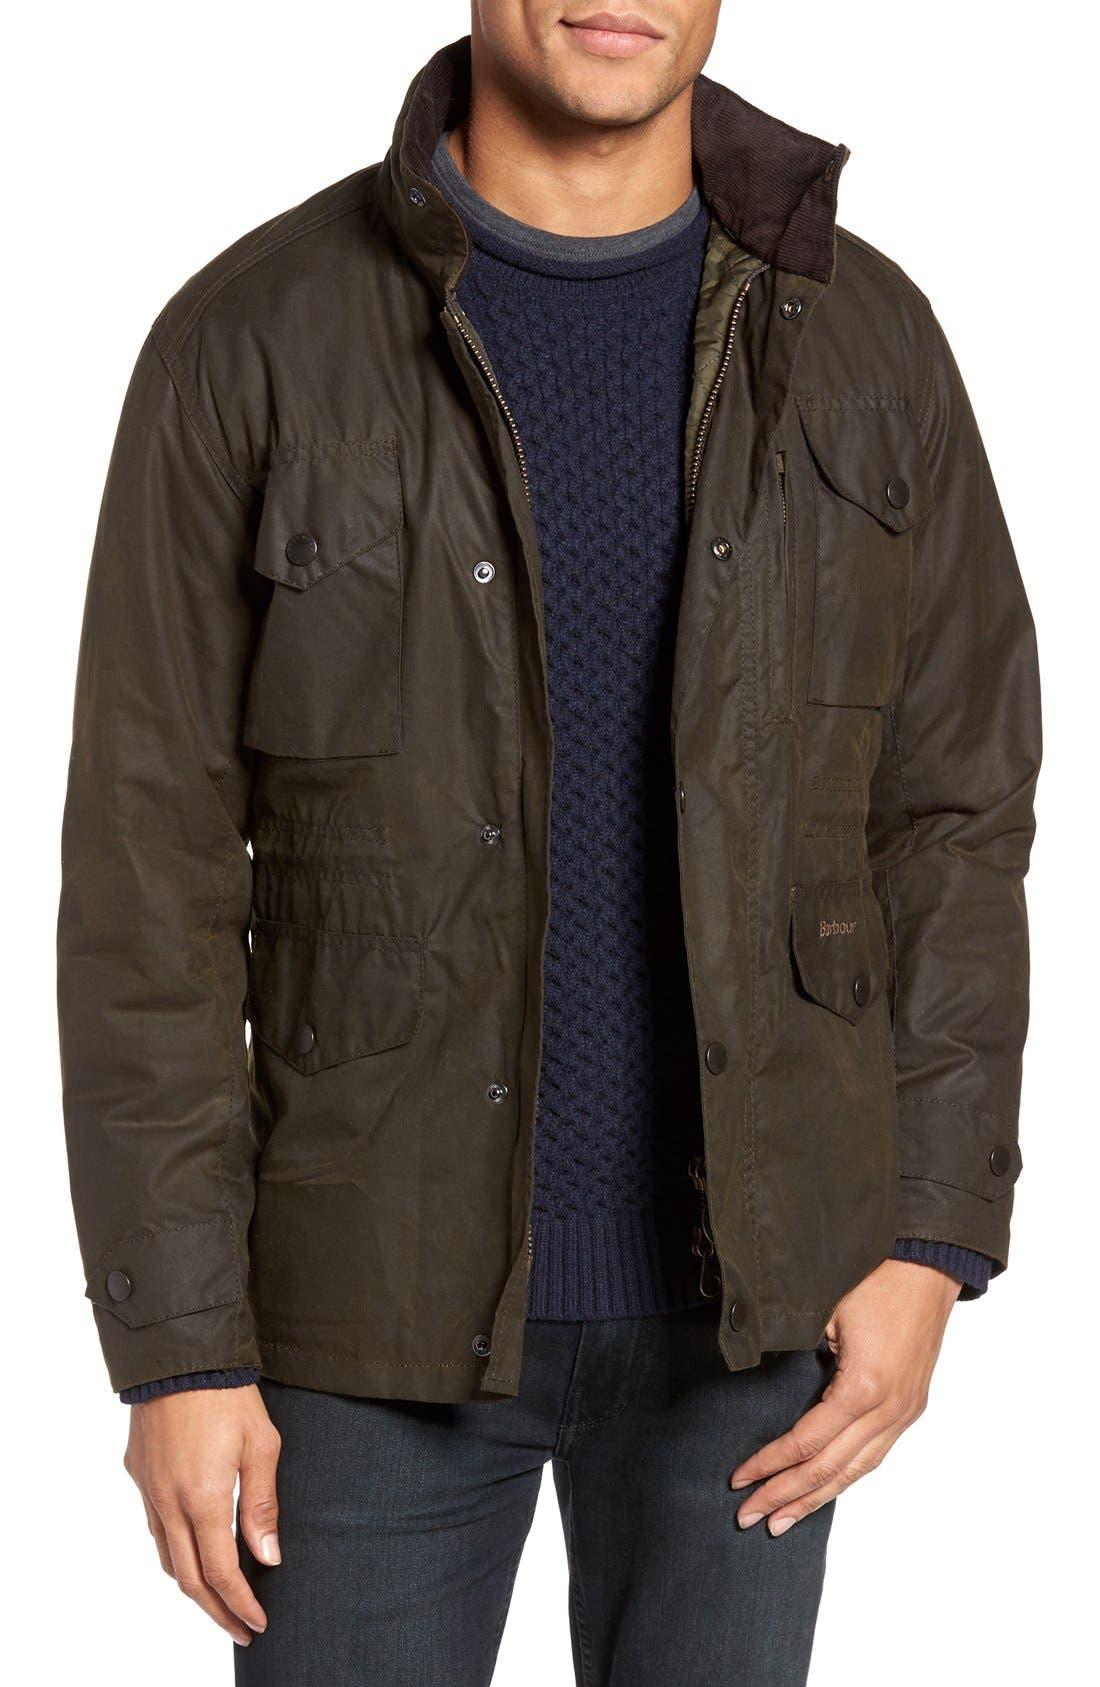 Alternate Image 1 Selected - Barbour 'Sapper' Regular Fit Waterproof Waxed Cotton Jacket